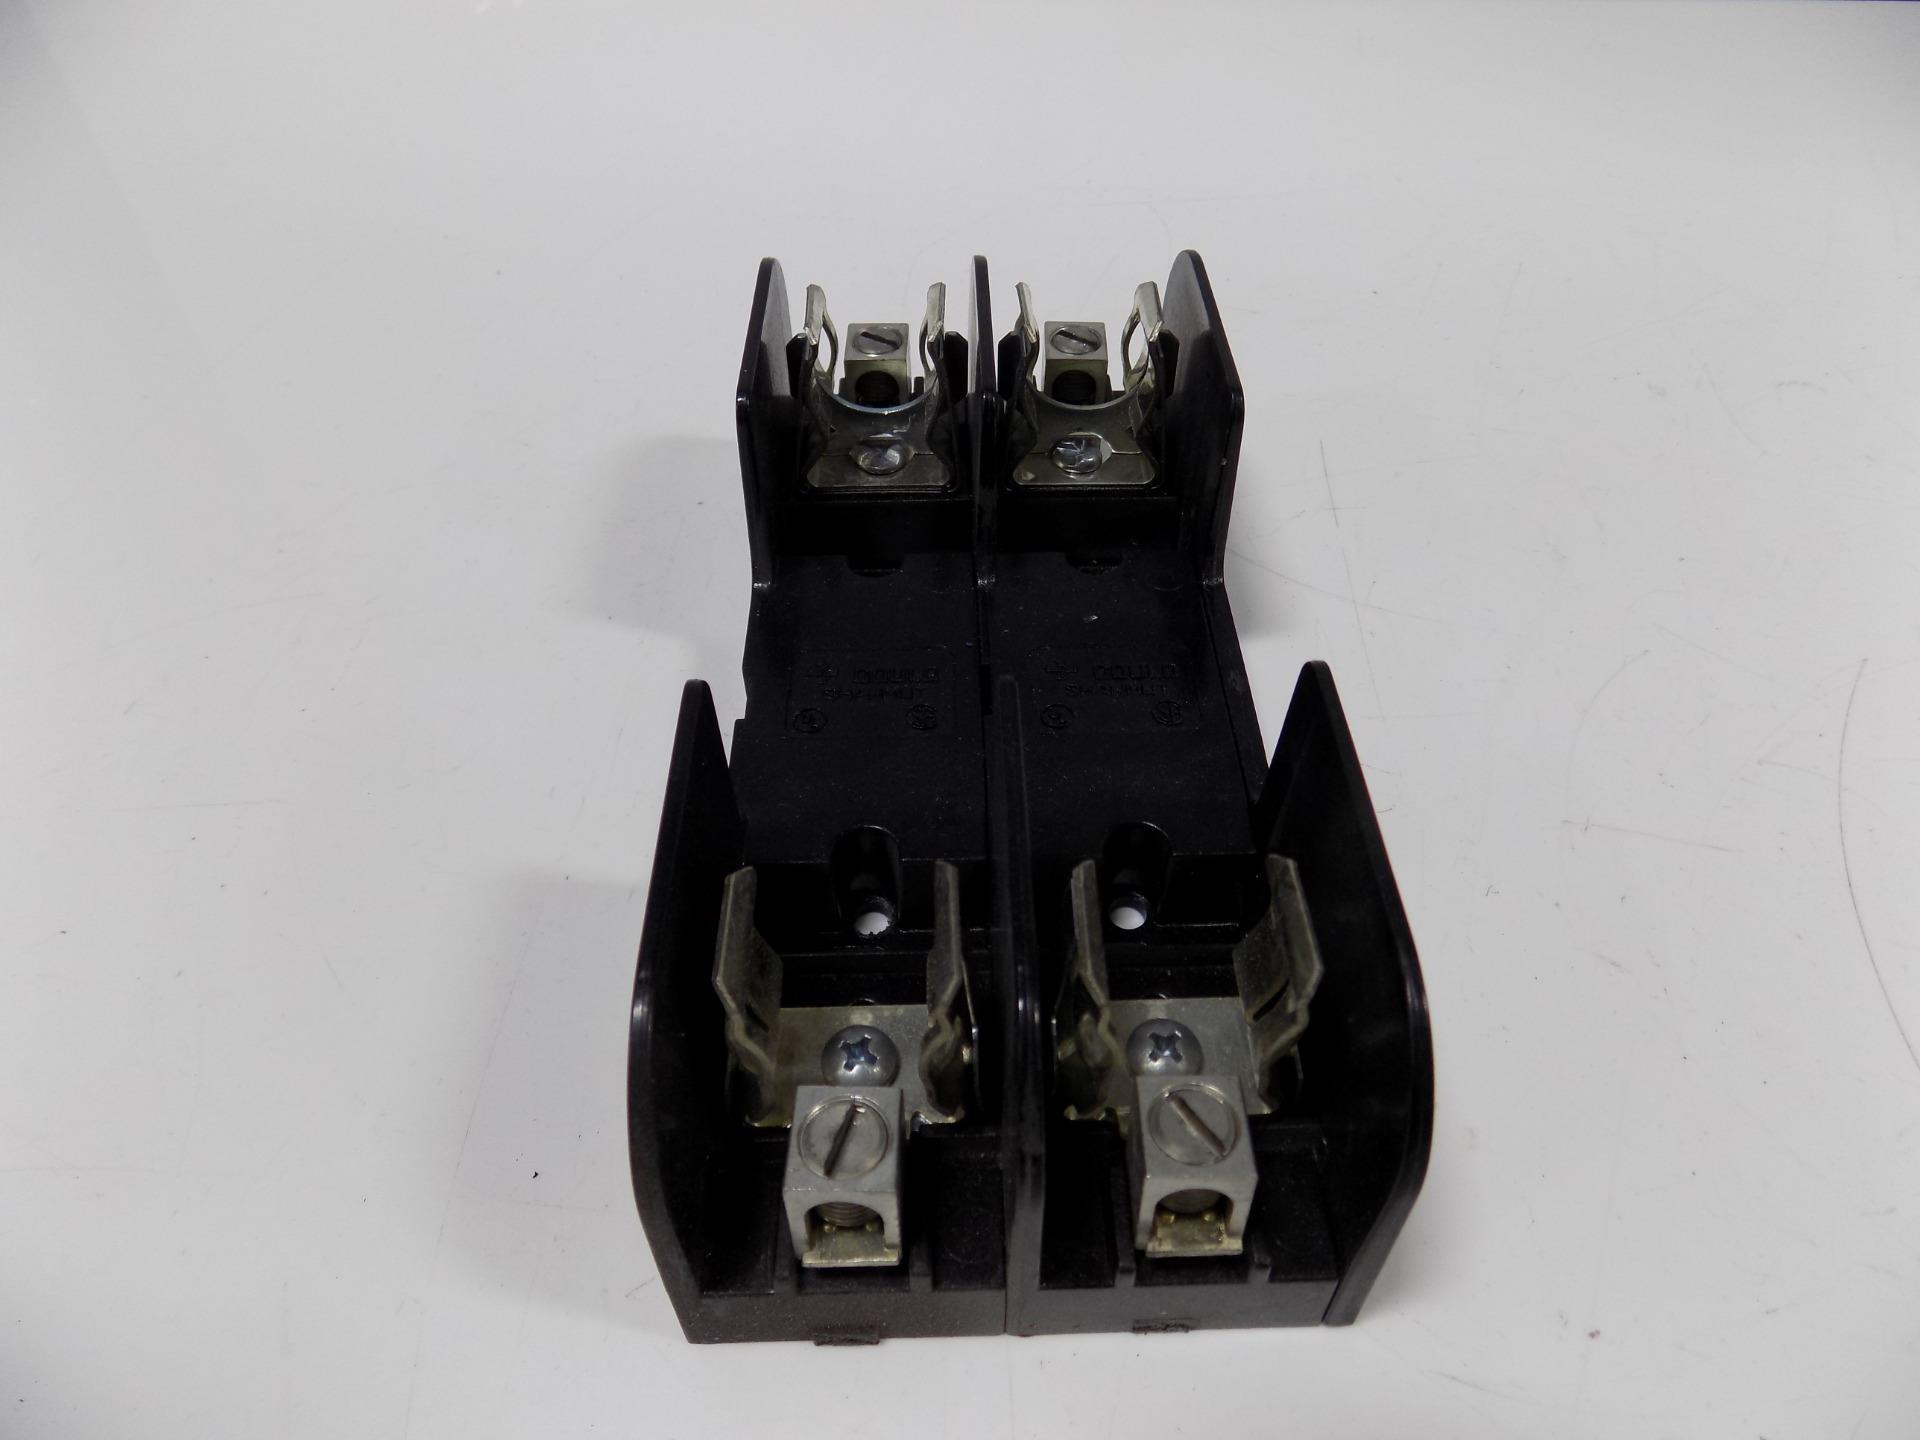 1 pc AS7C4098A-12TC   SRAM 4MBIT 12nS   5V  256x16K   TSOP44    NEW  #BP